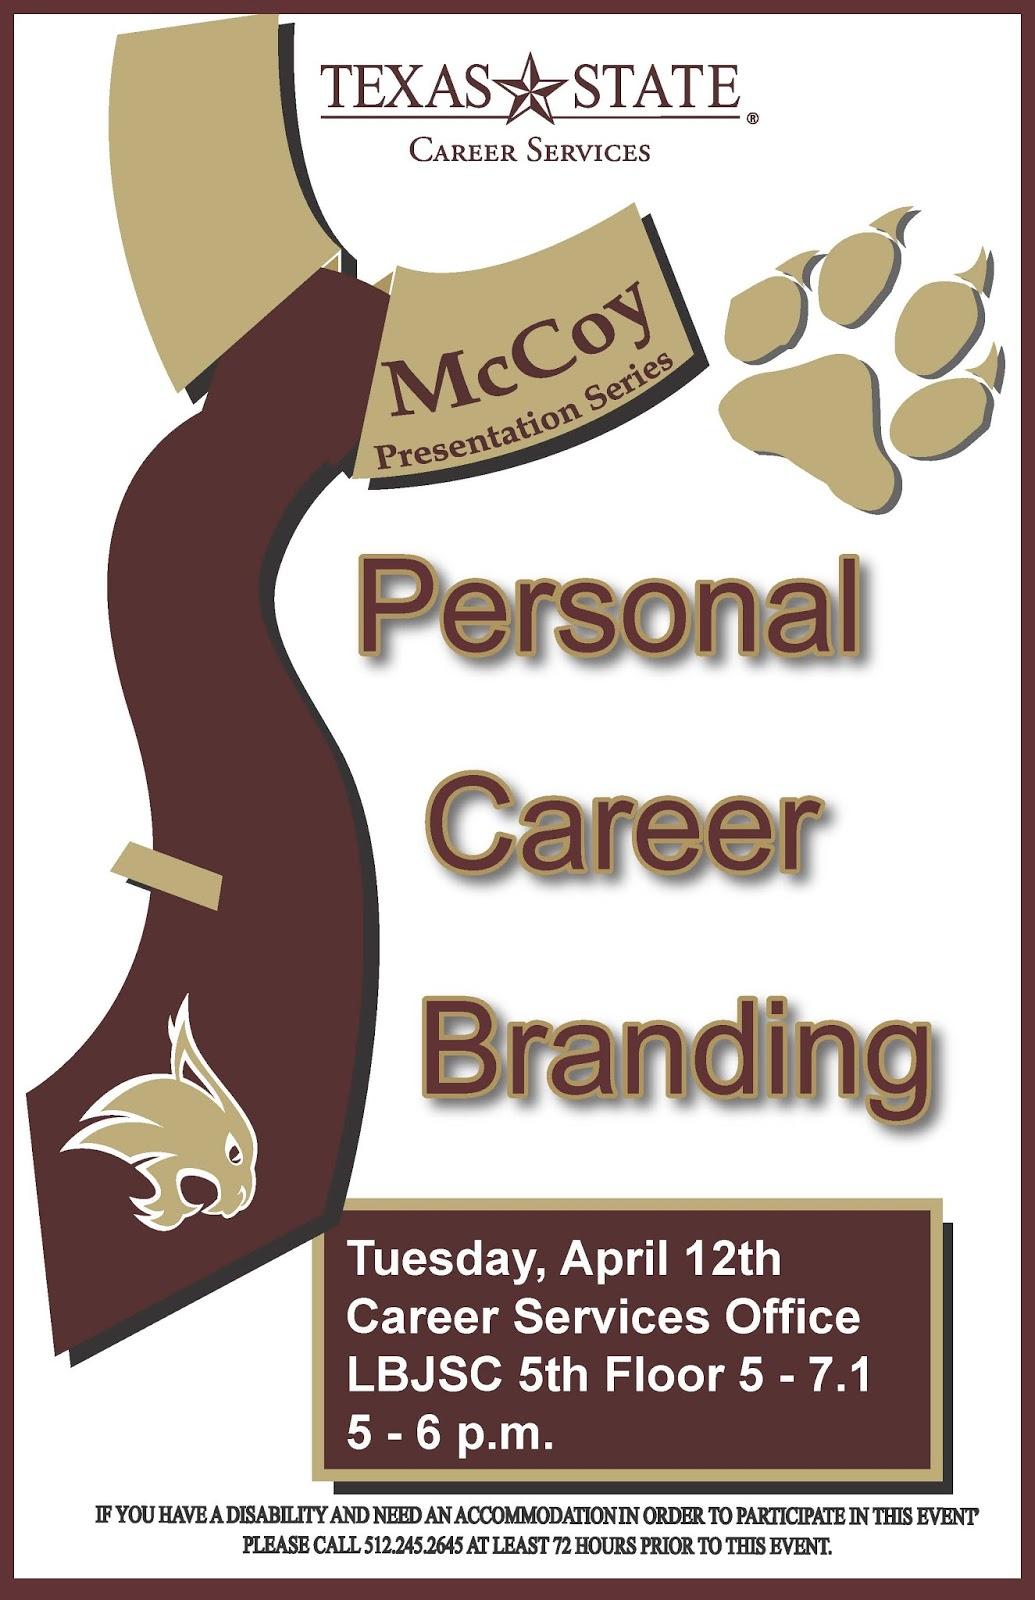 mccoy college academic advising blog mccoy college presentation mccoy college presentation series personal career branding